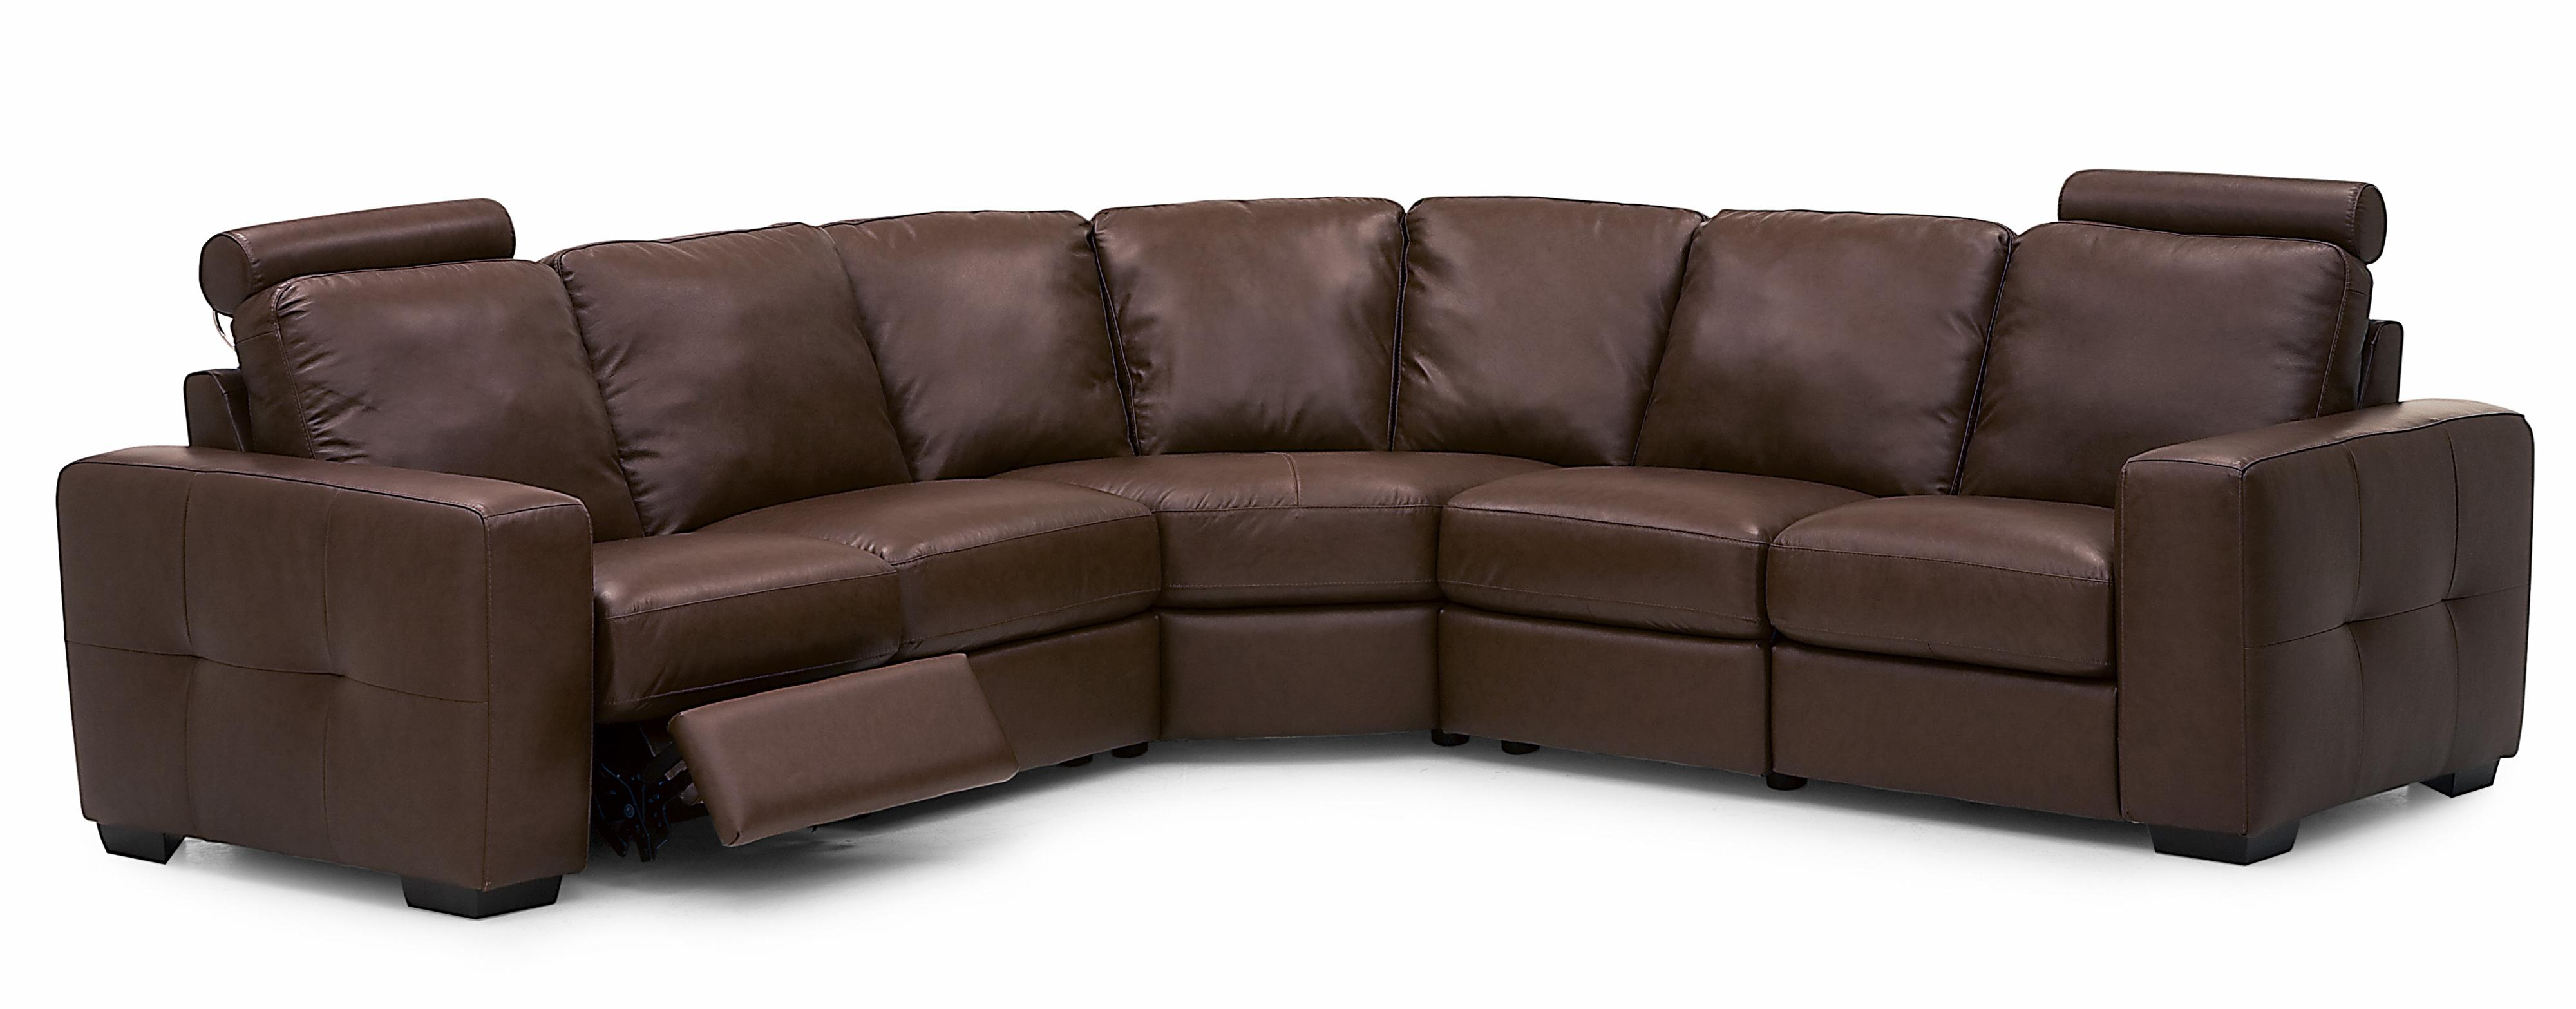 Palliser Push Contemporary Dual Reclining Sectional Sofa